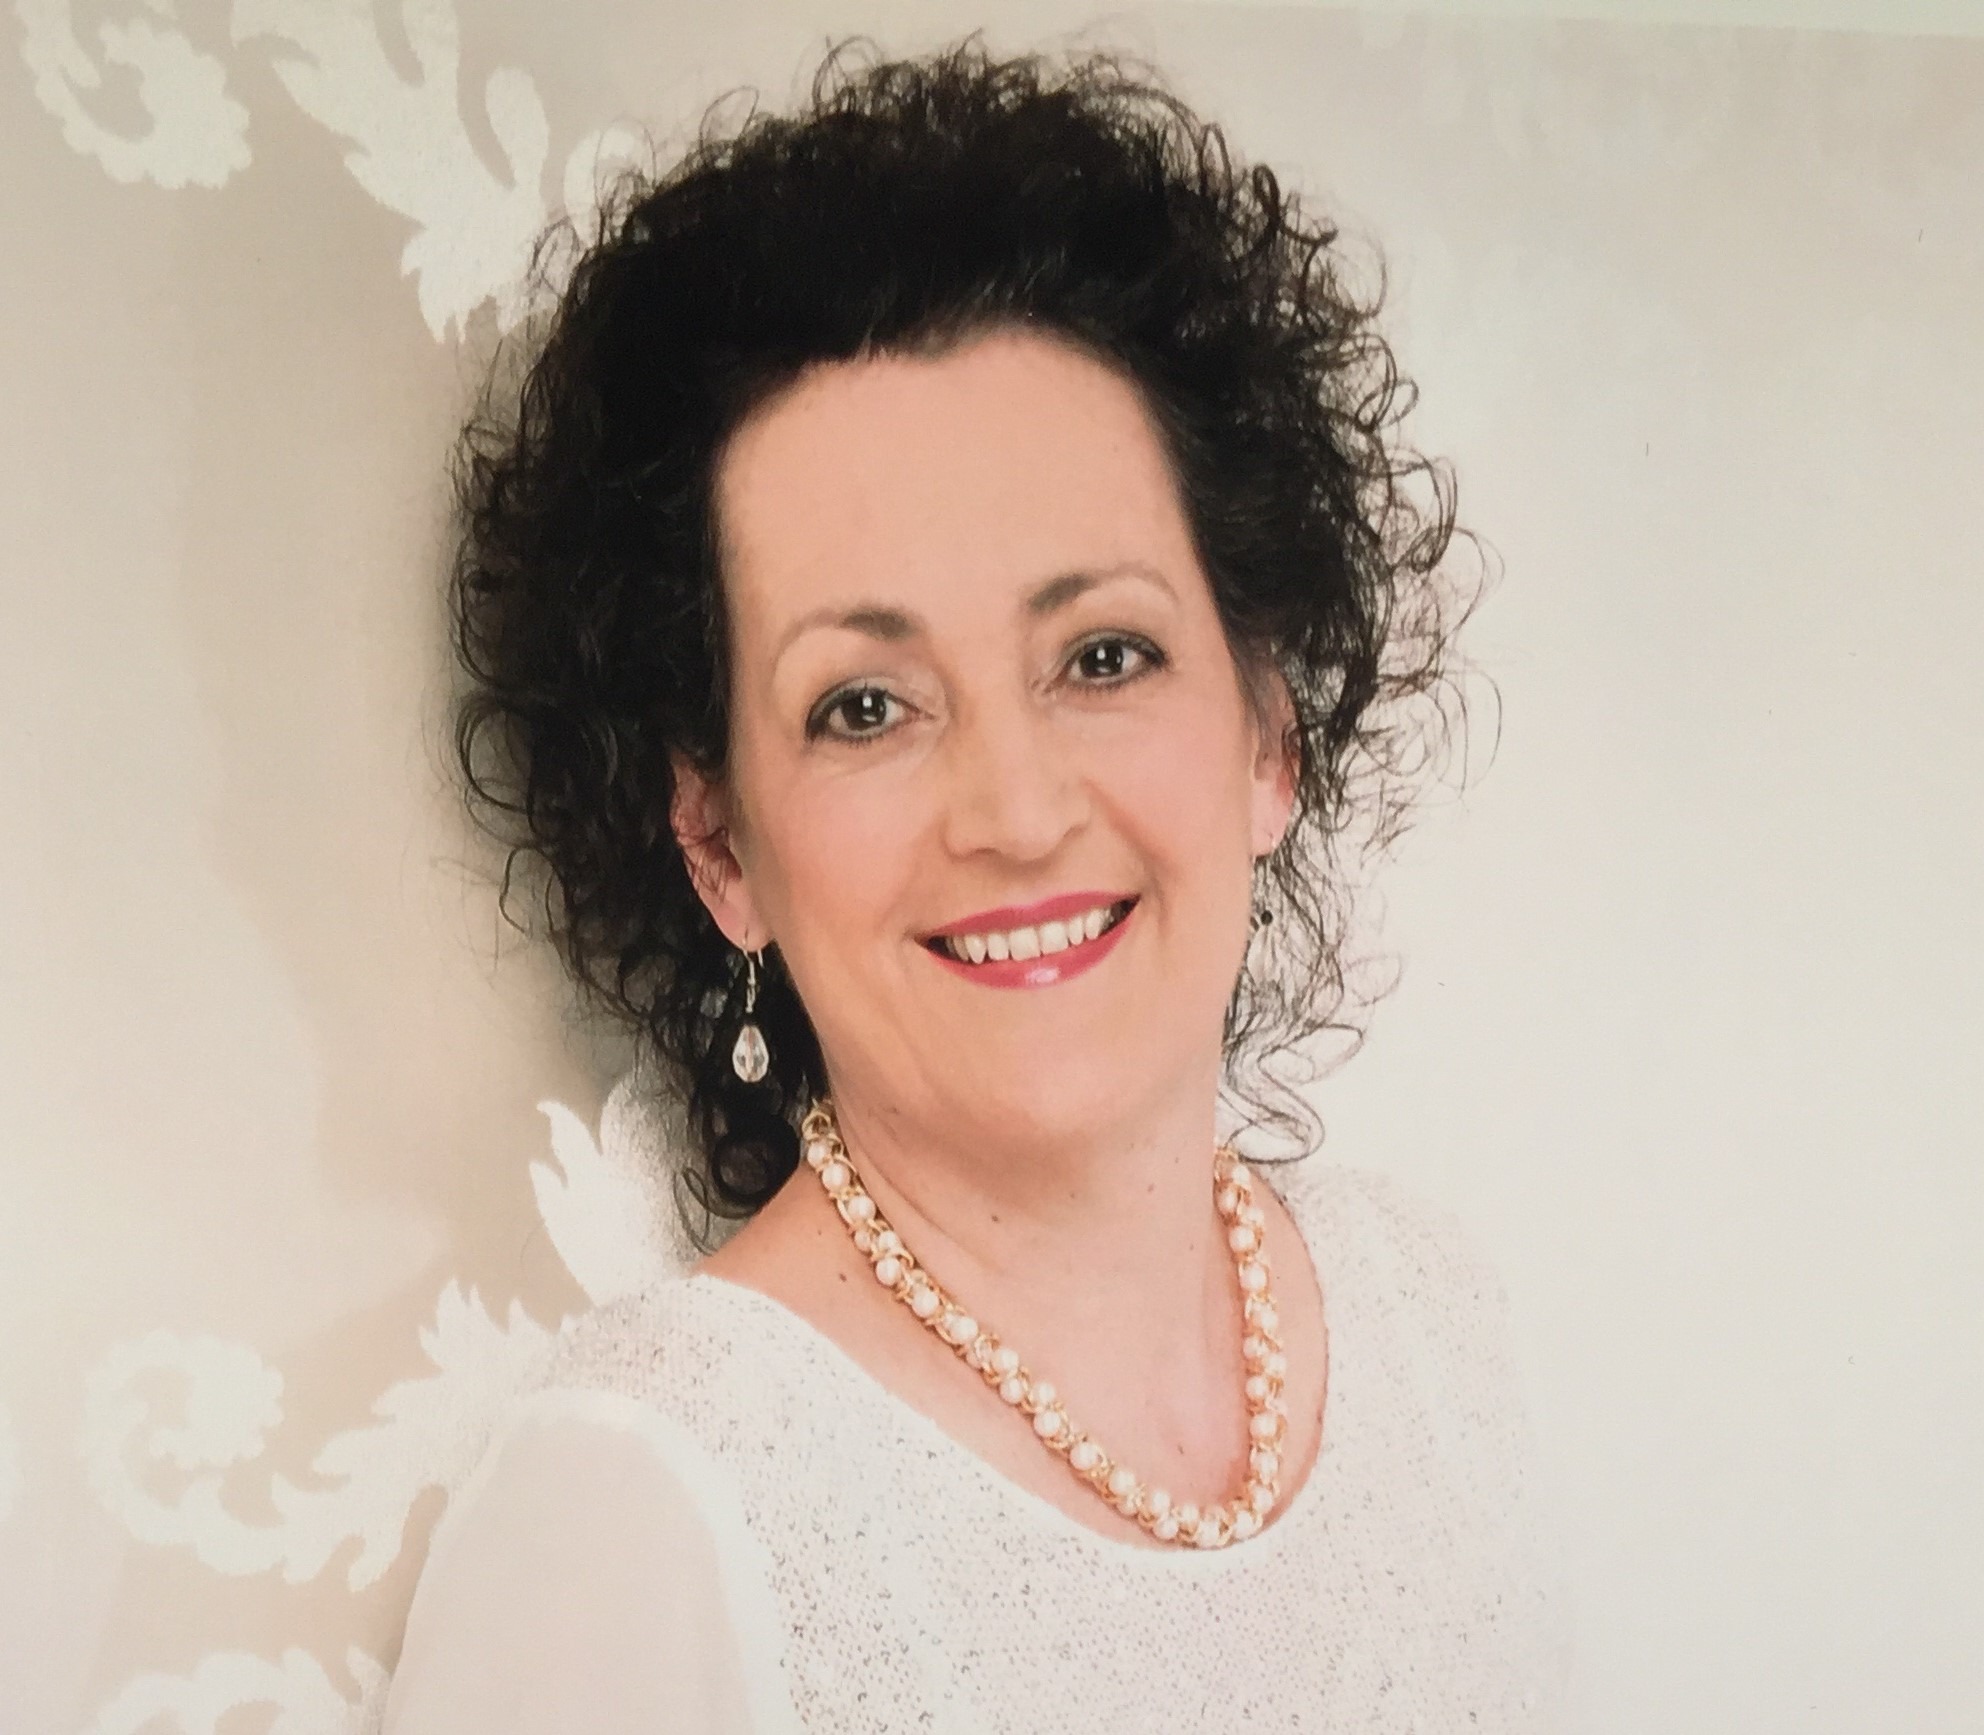 Angela Keidel - Inhaberin Kosmetikstudio Kempten